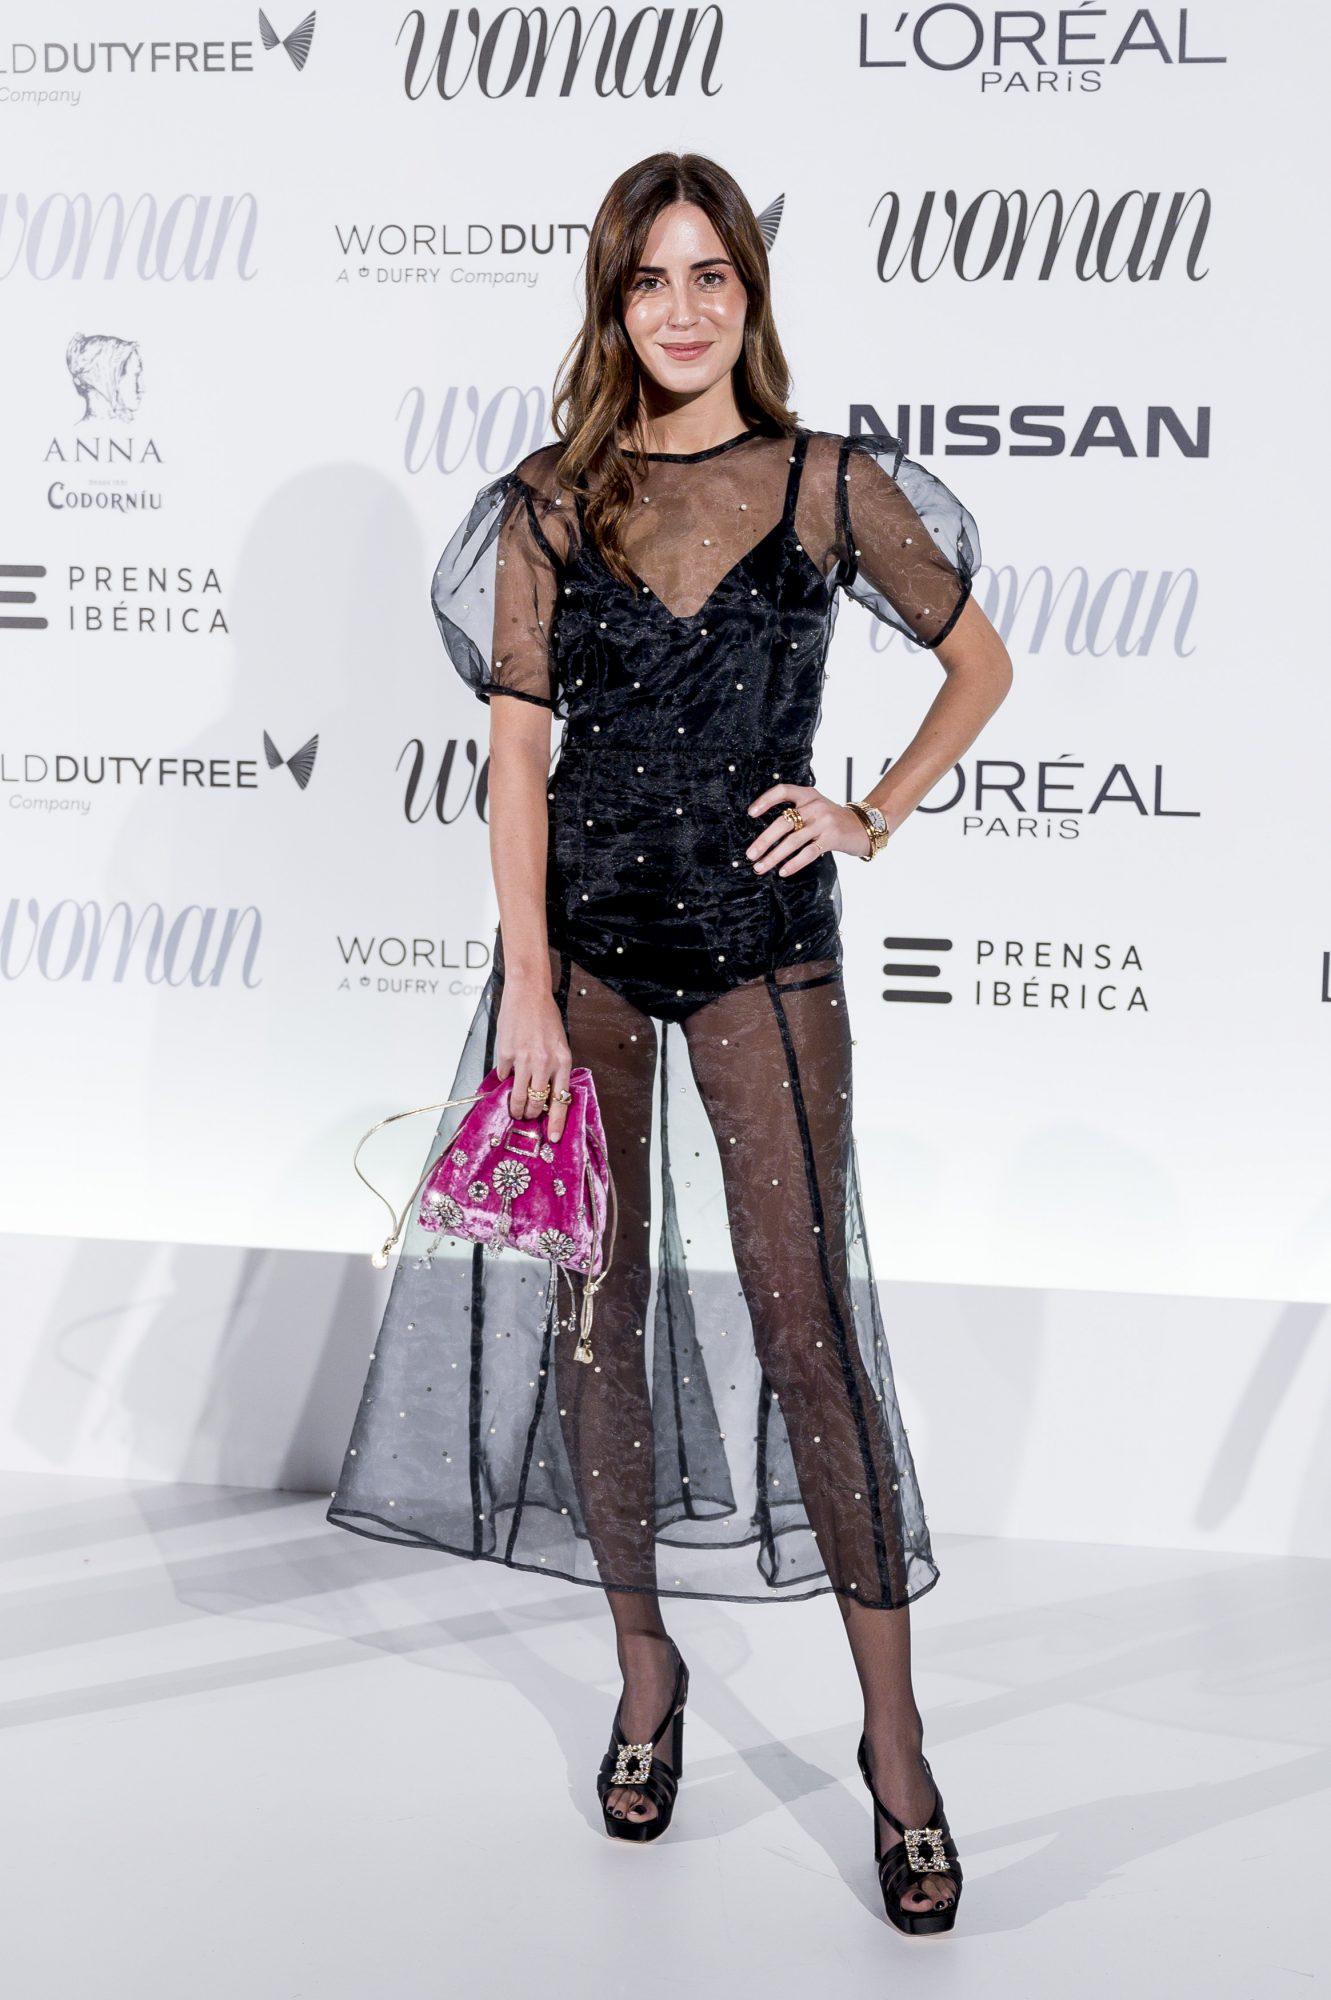 'Woman Madame Figaro' Awards 2019